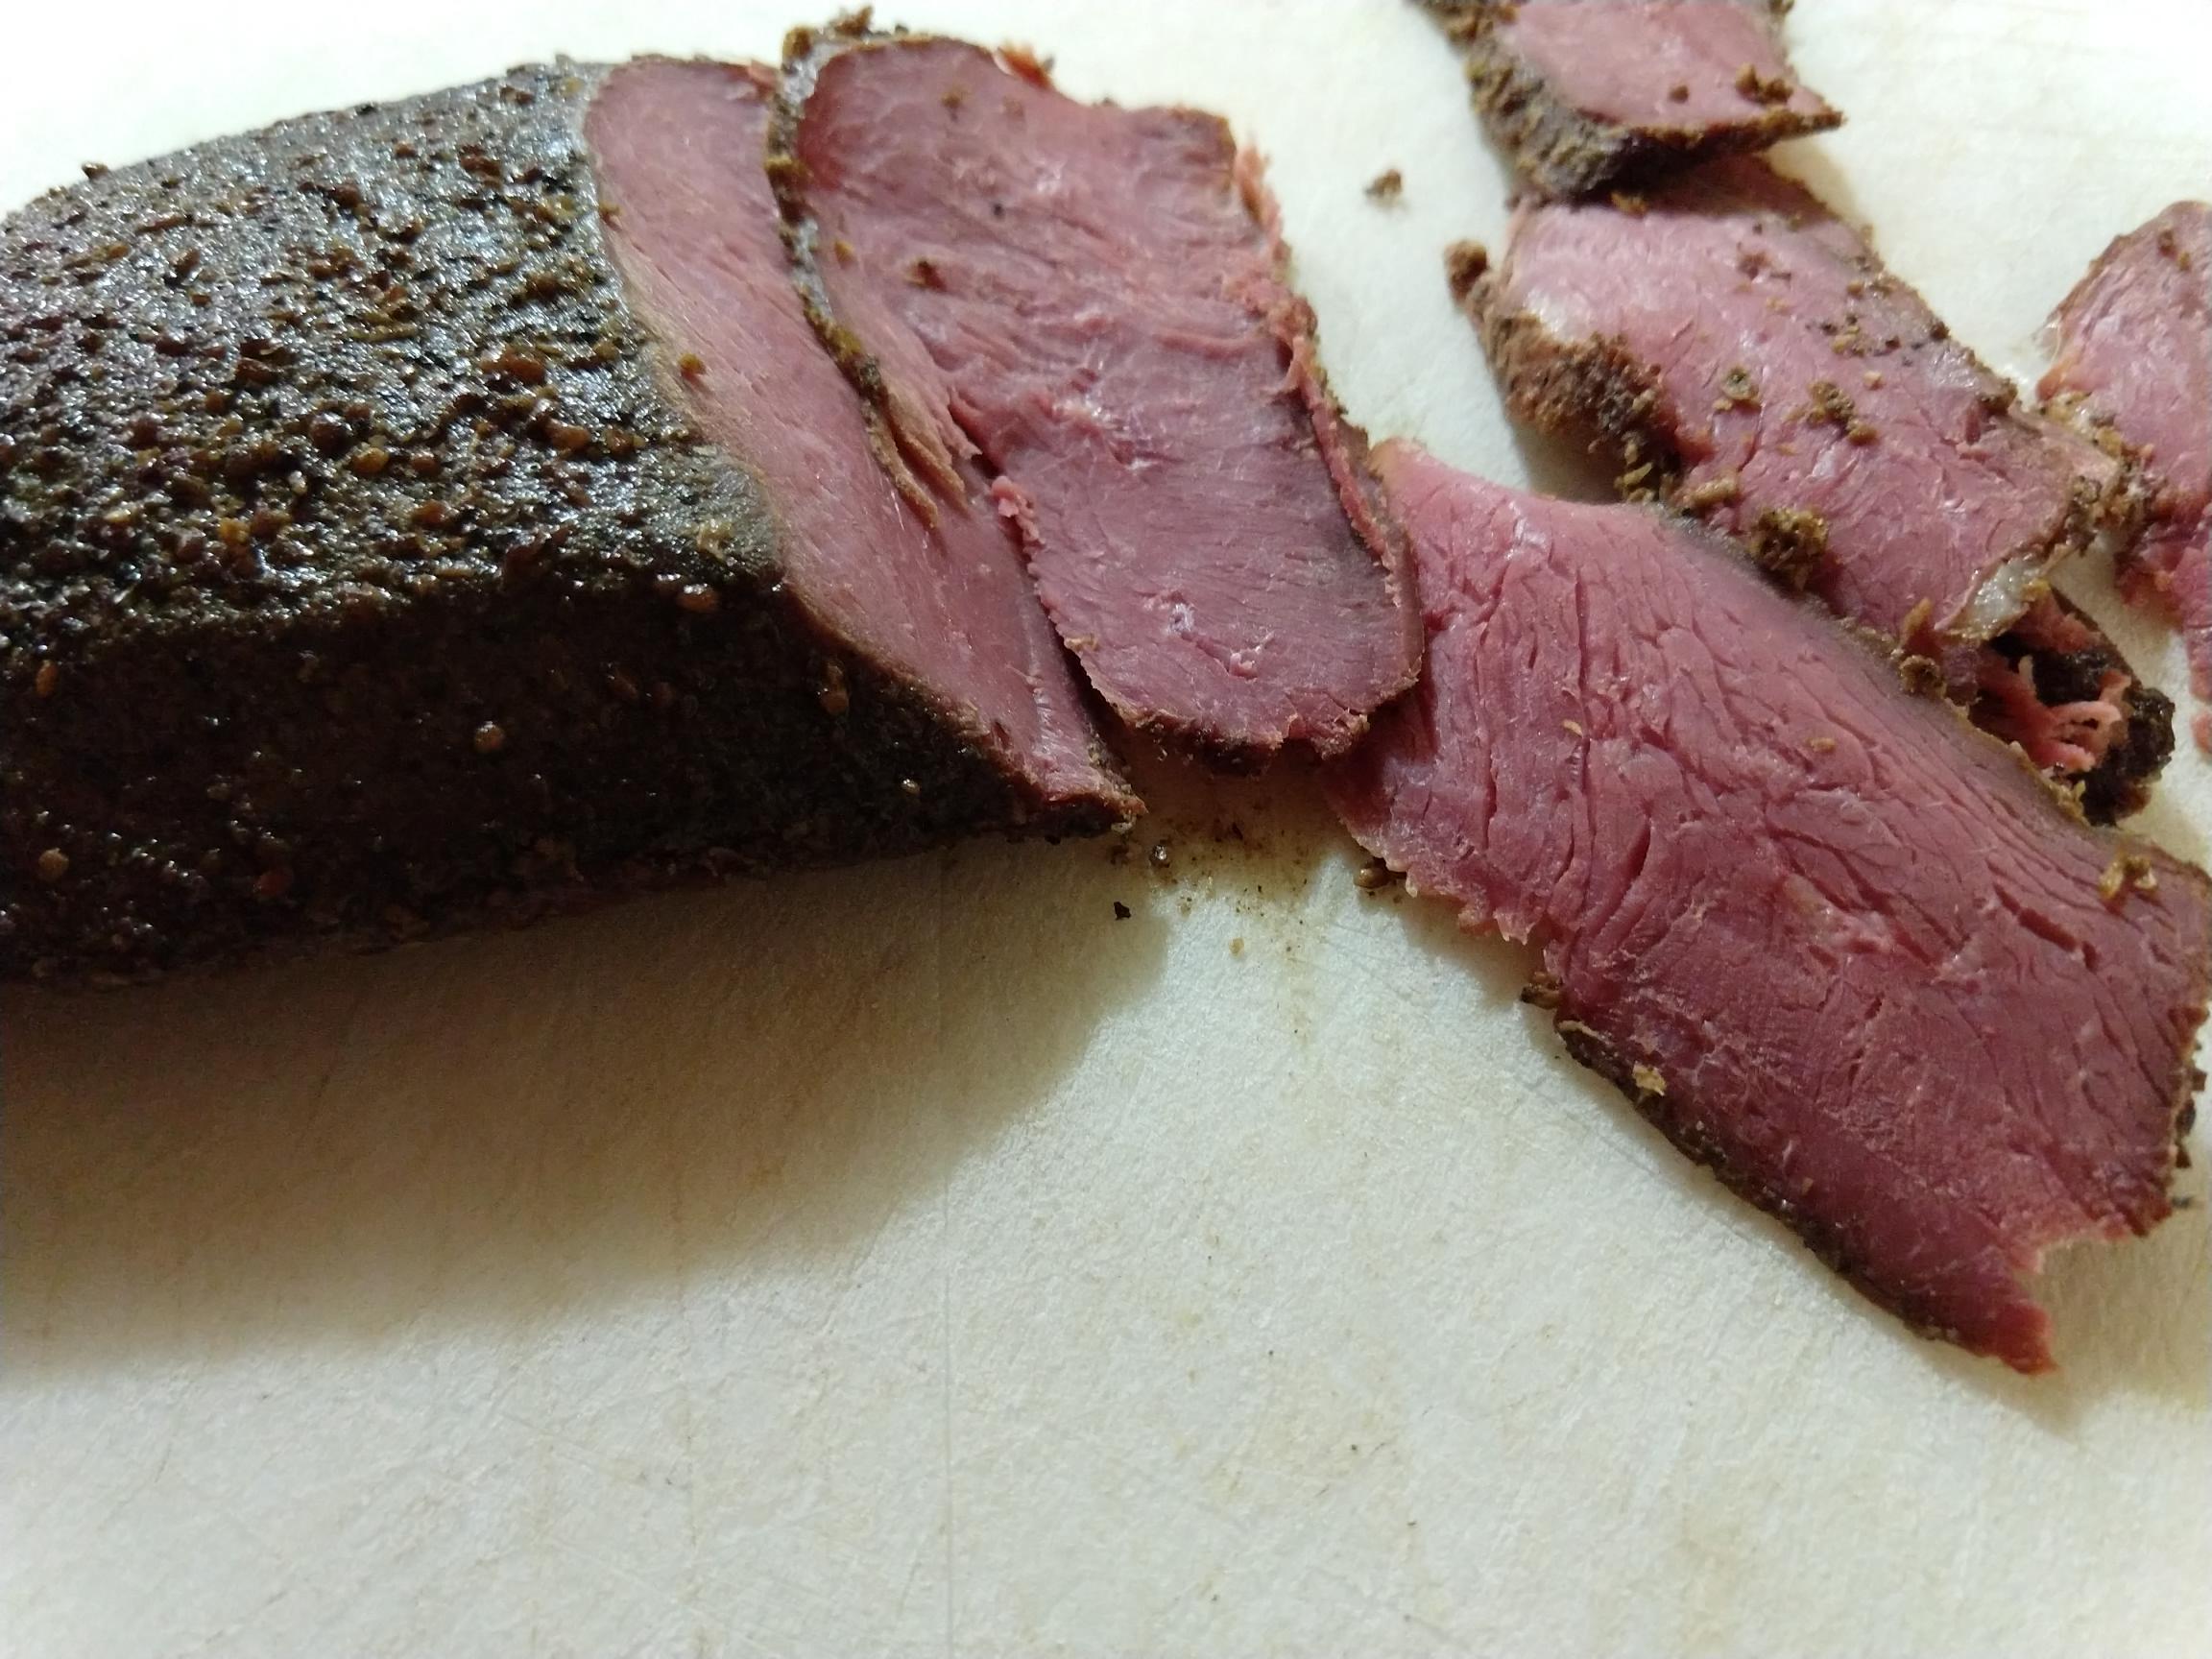 Smoked goose breast, Pastrami-style